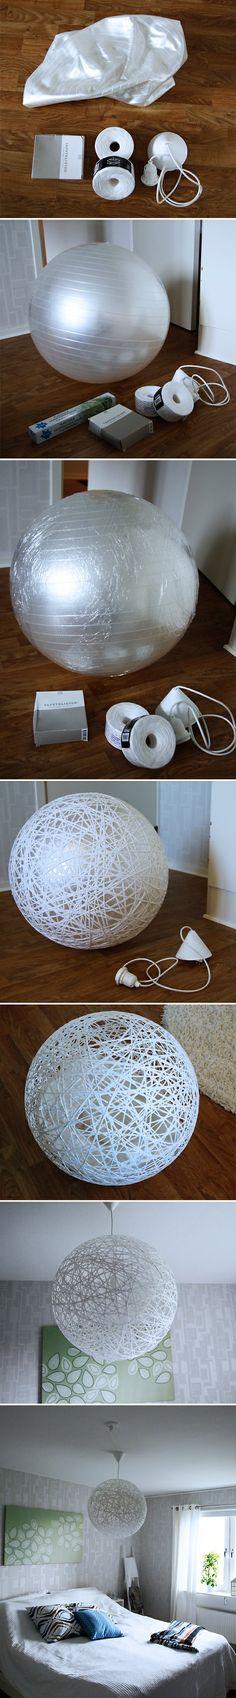 lampara hecha con una pelota